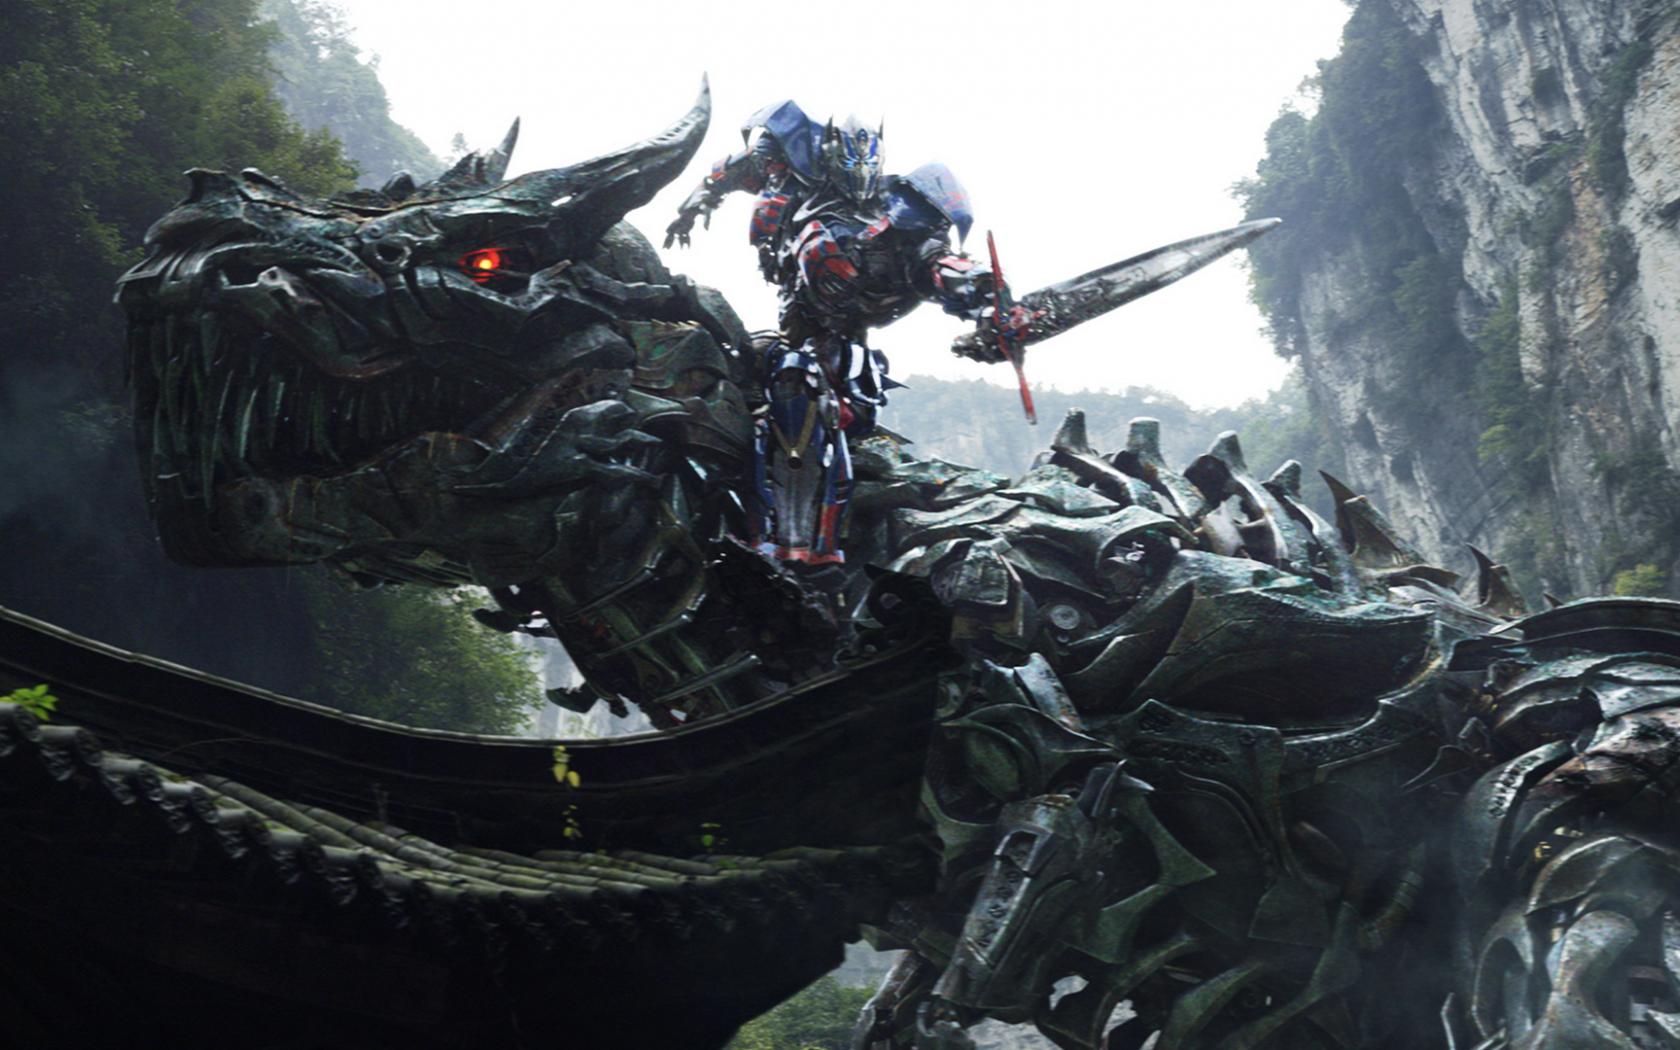 Free Download Transformers 4 Wallpaper Optimus Prime Grimlock And